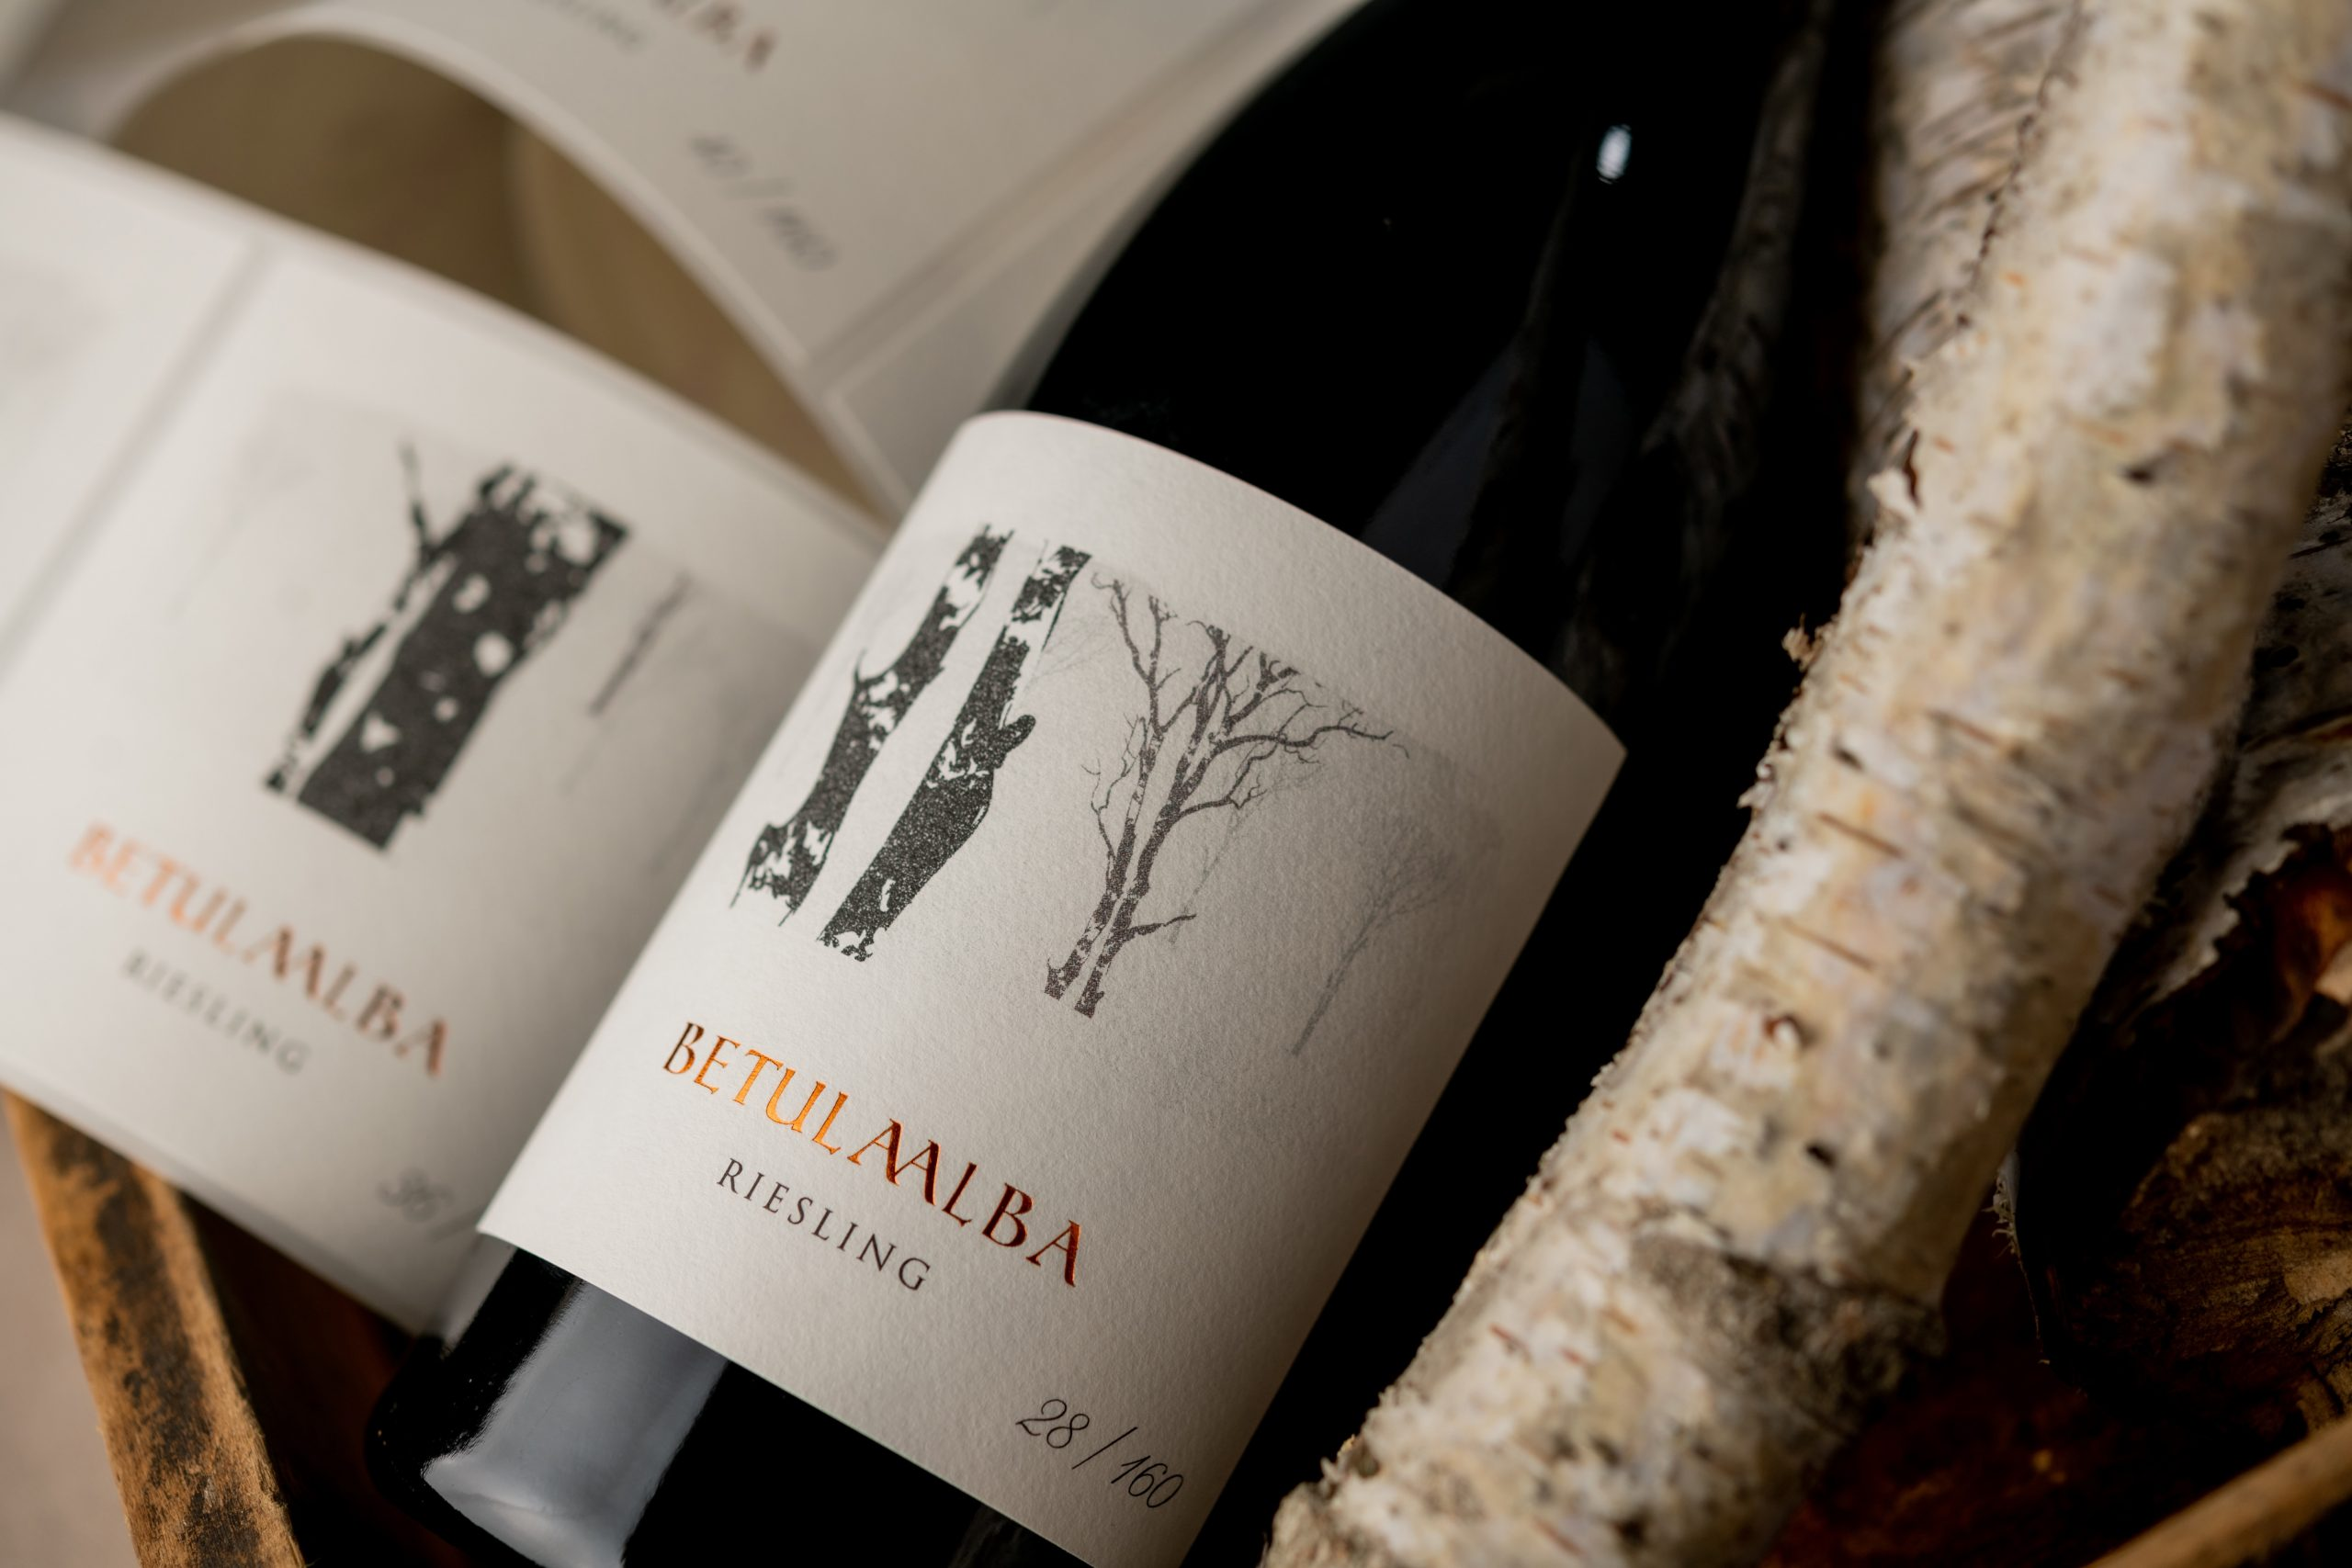 ILMA Etichette-BetulaAlba per fedrigoni top award